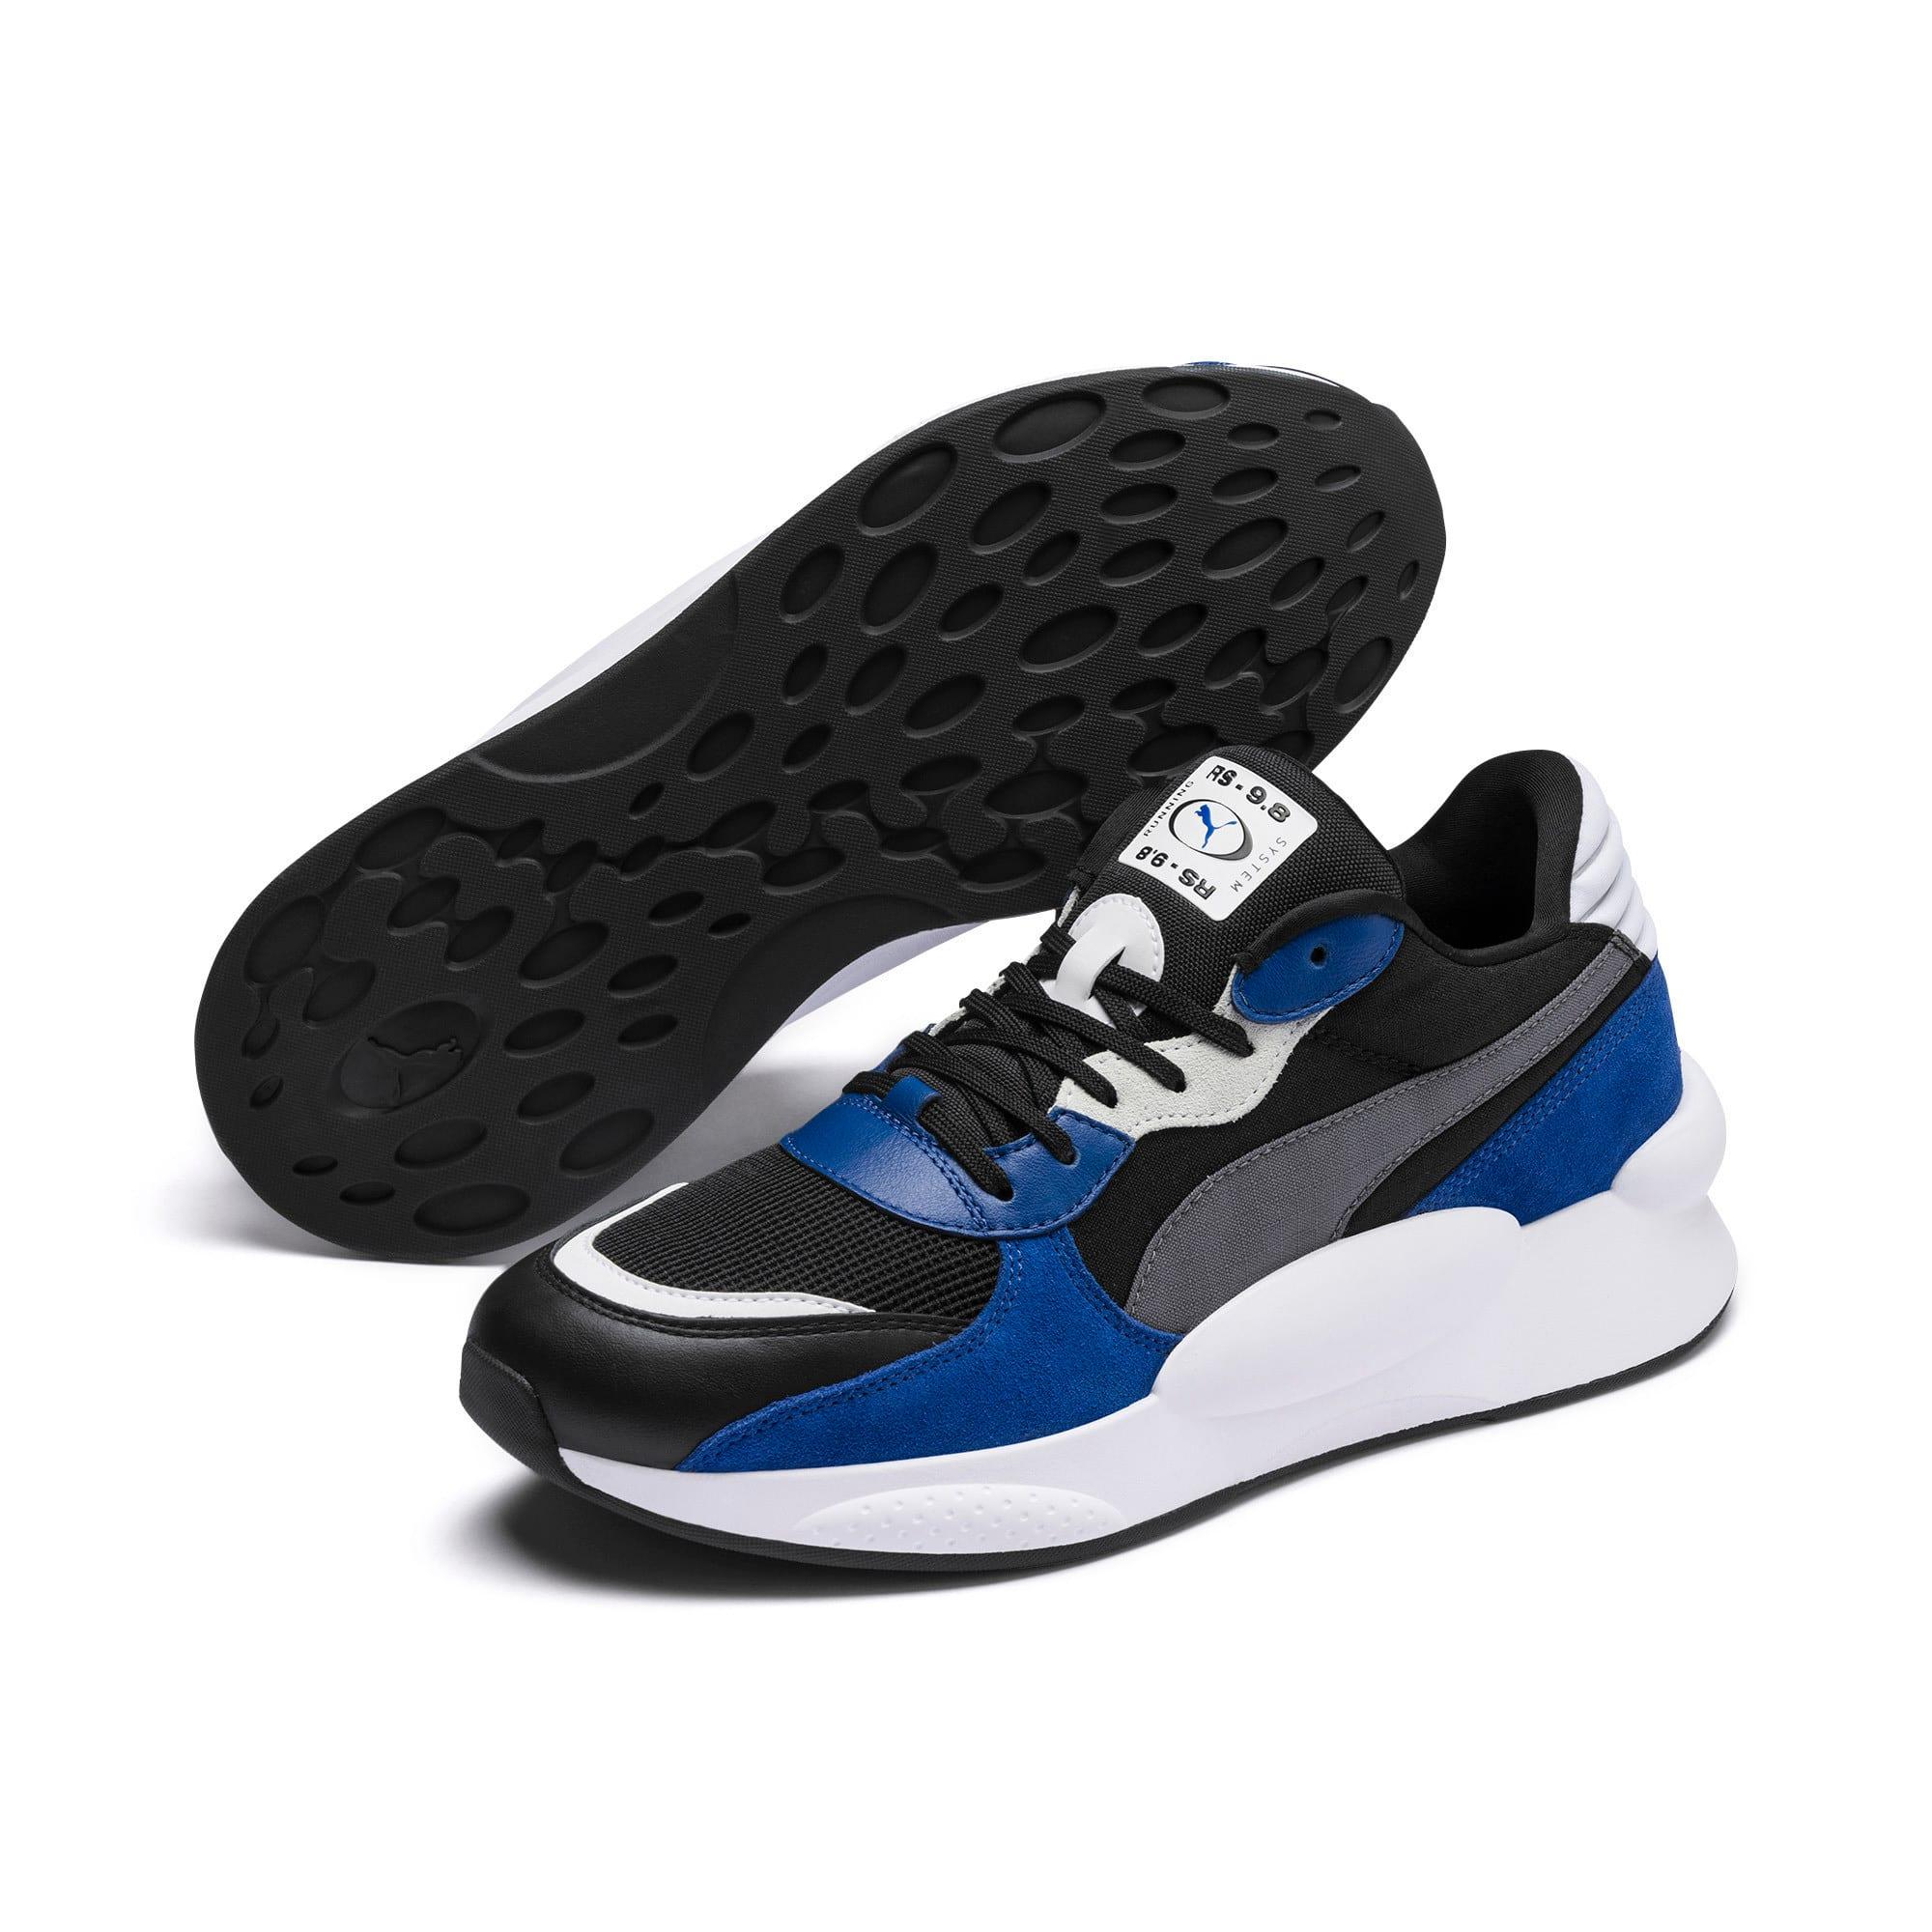 Thumbnail 2 of RS 9.8 Space Sneakers, Puma Black-Galaxy Blue, medium